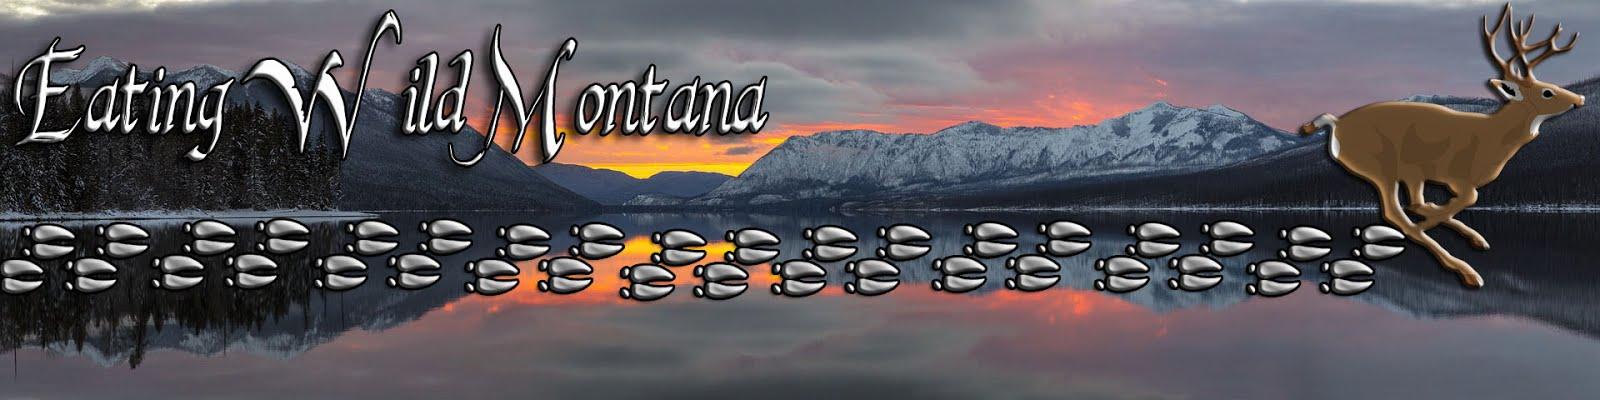 Eating Wild Montana